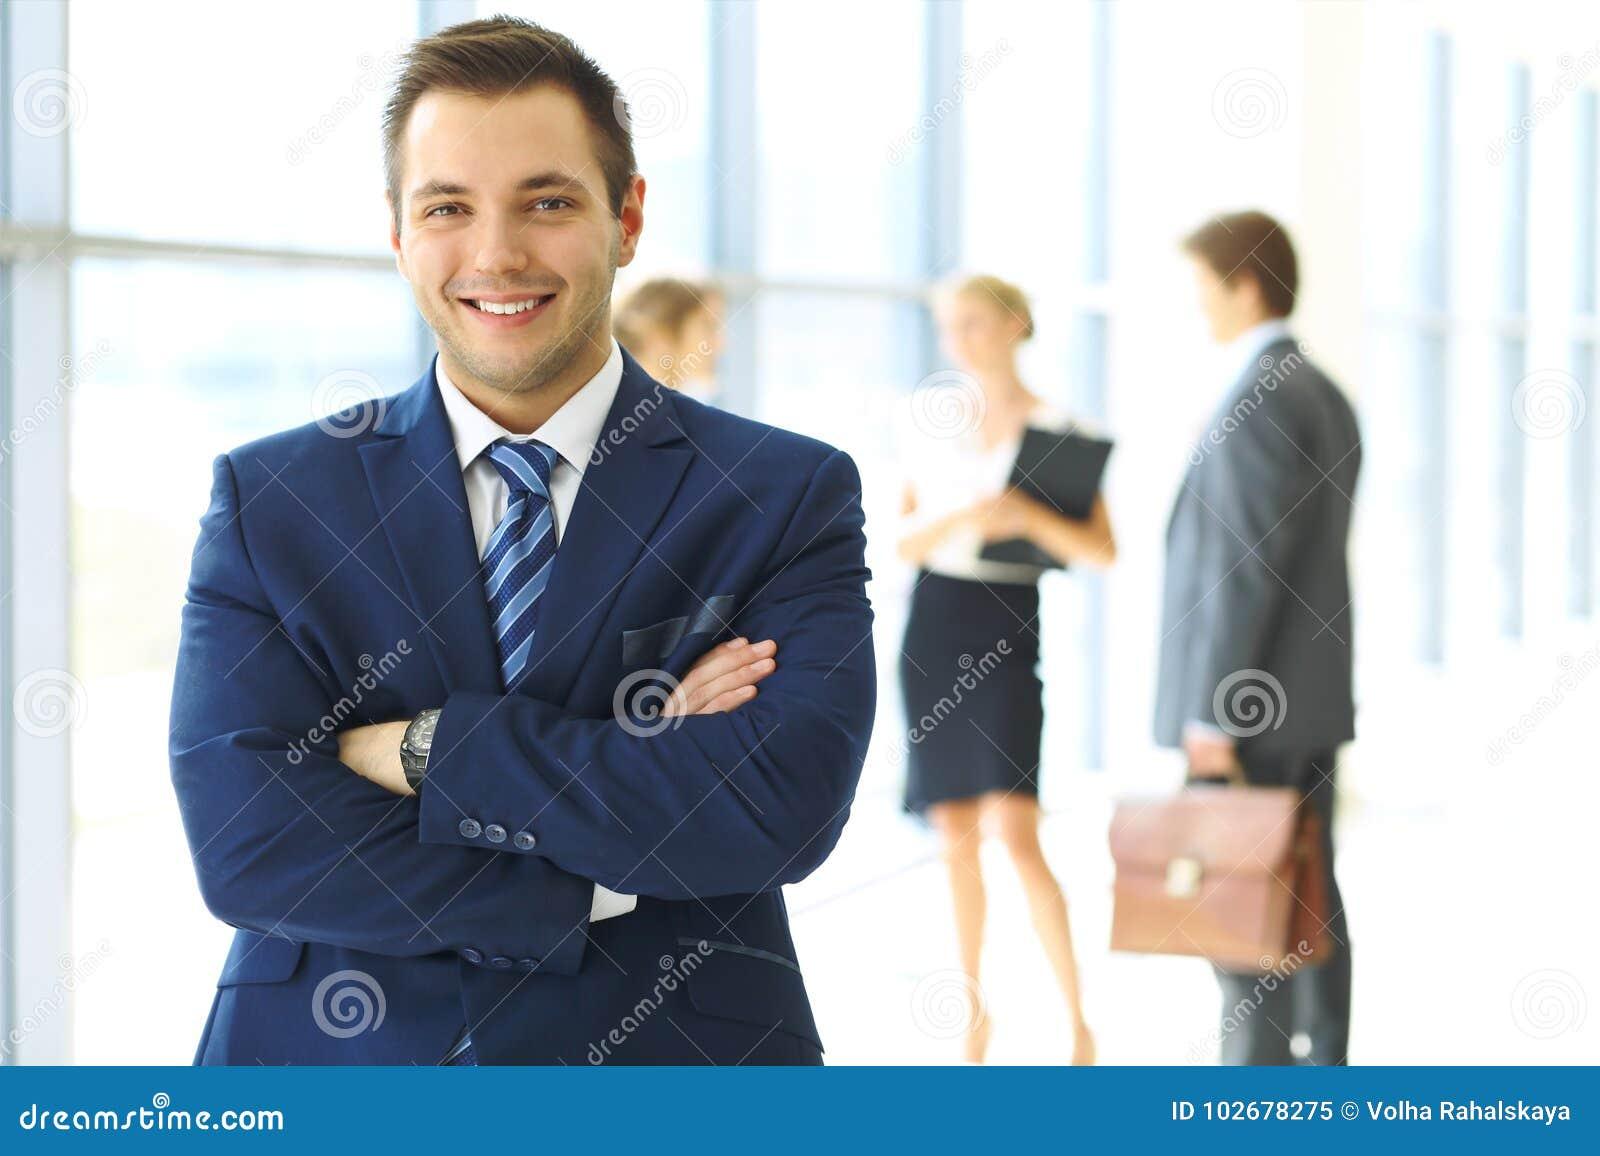 Усмехаясь бизнесмен в офисе с коллегами на заднем плане